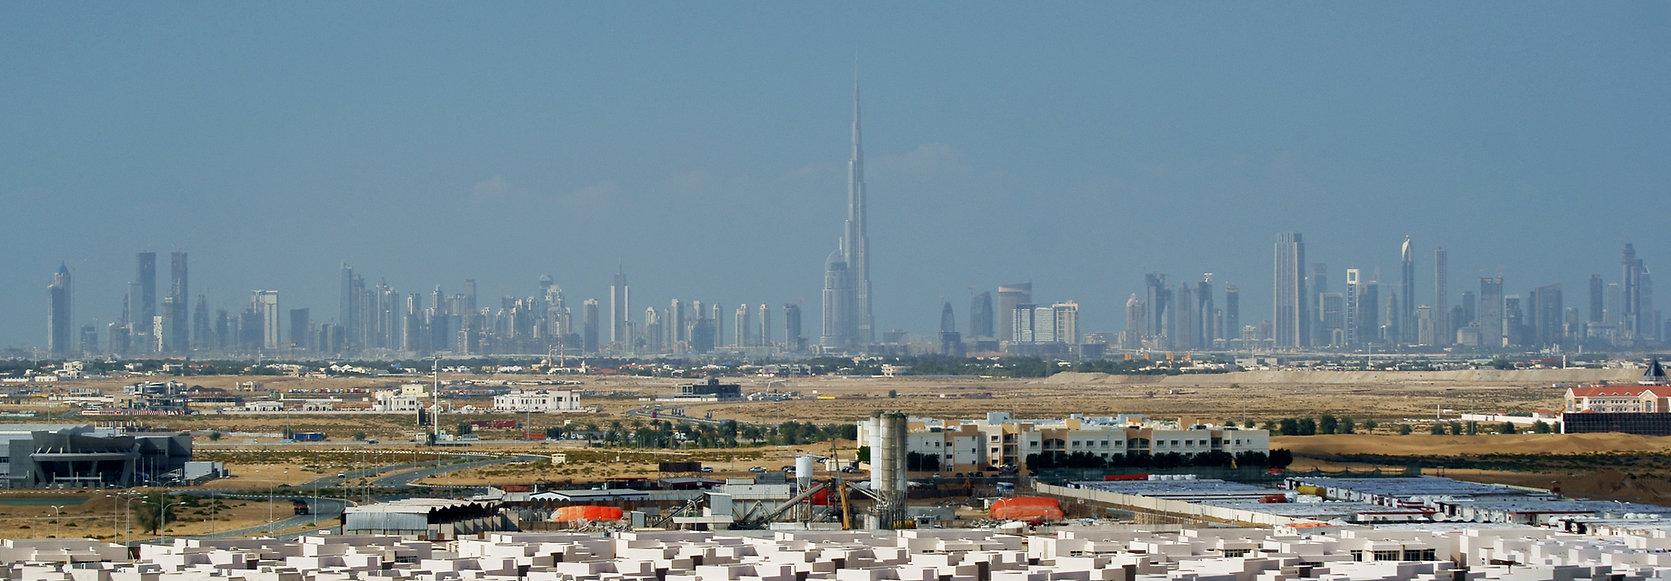 Burj_Dubai_001.jpg